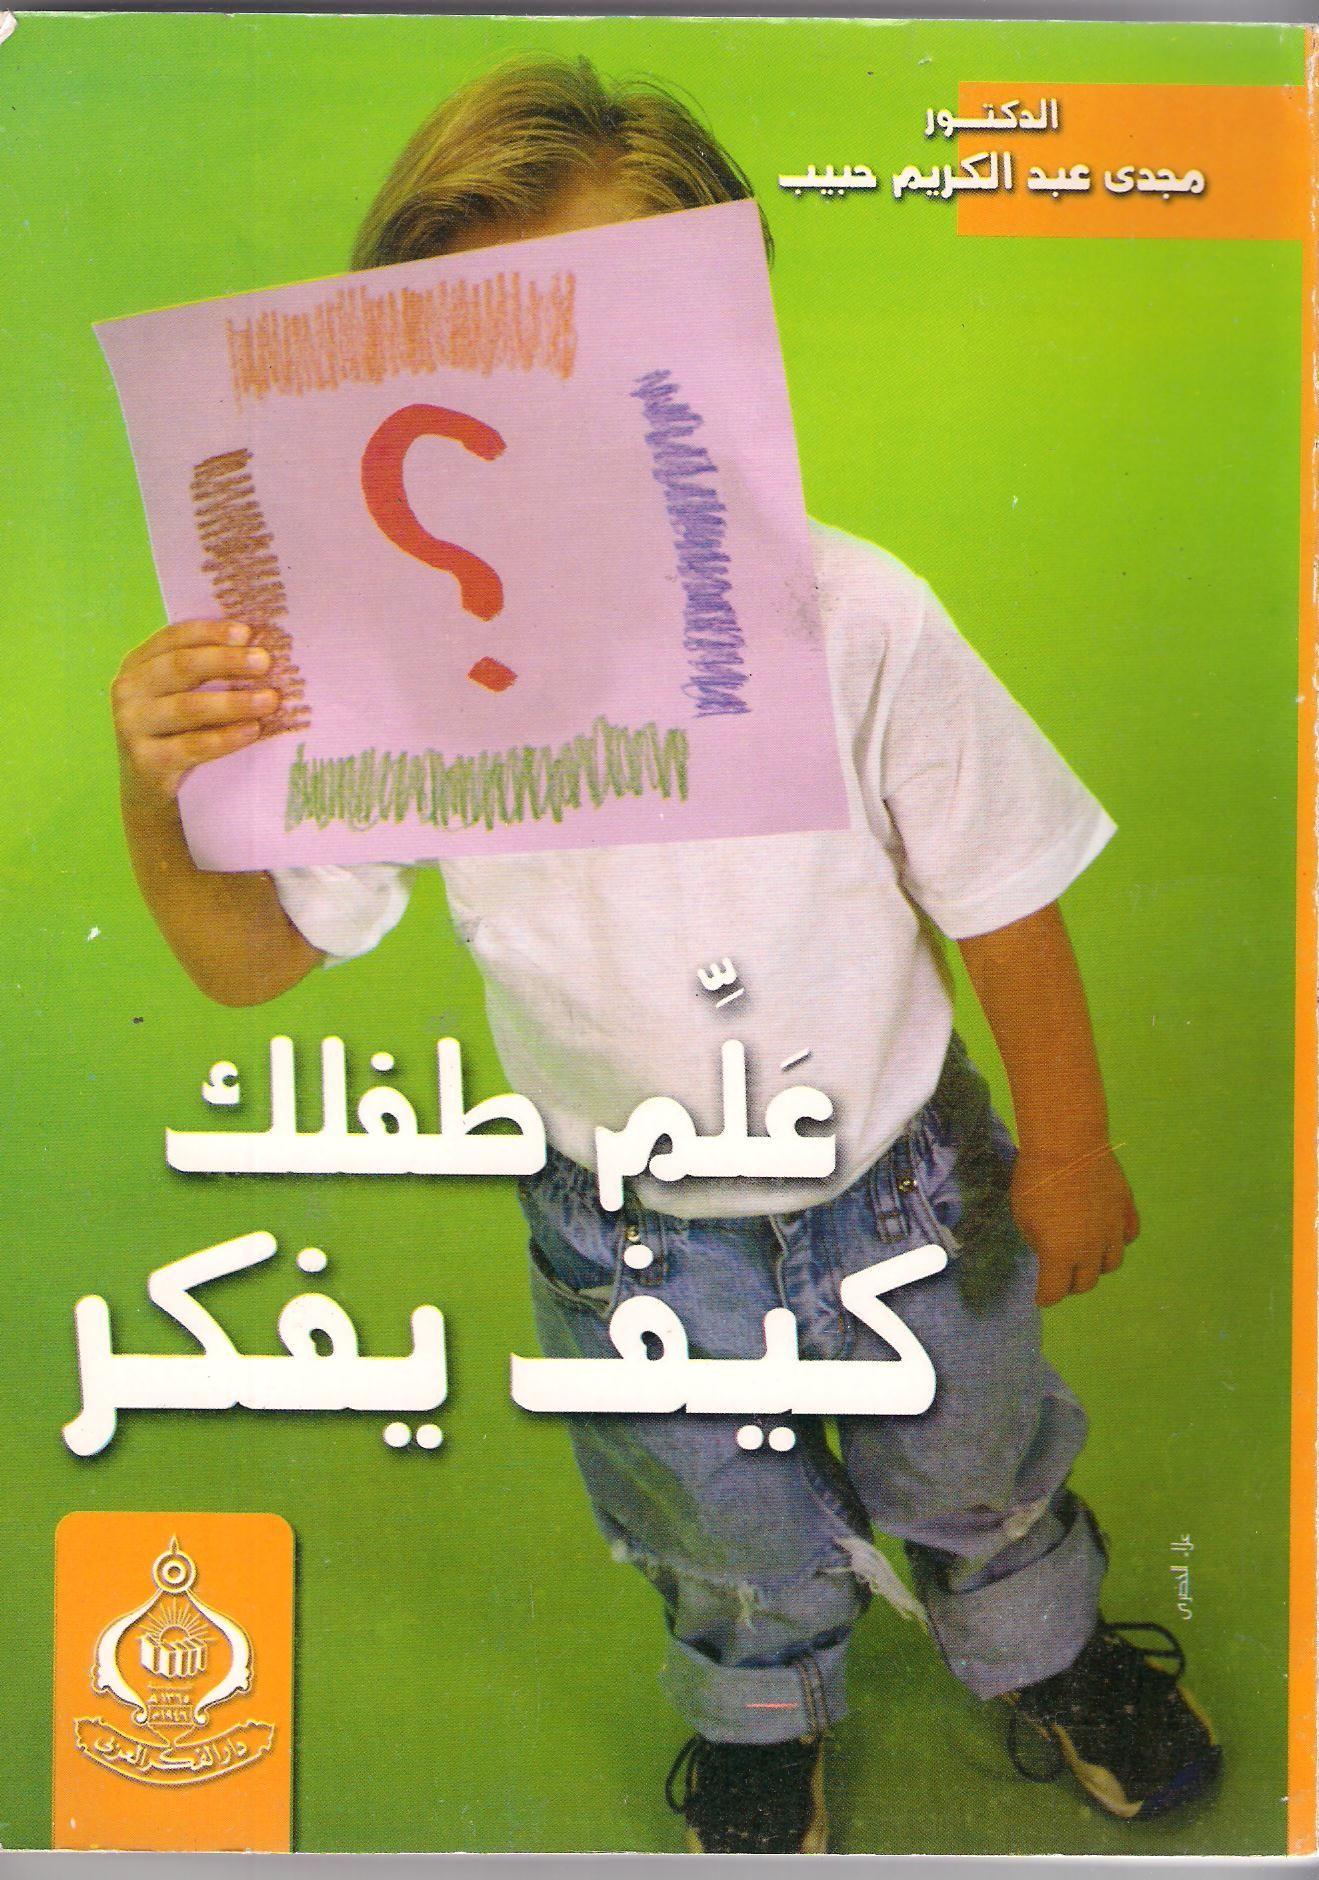 علم طفلك كيف يفكر Baby Education Islam For Kids Books Free Download Pdf